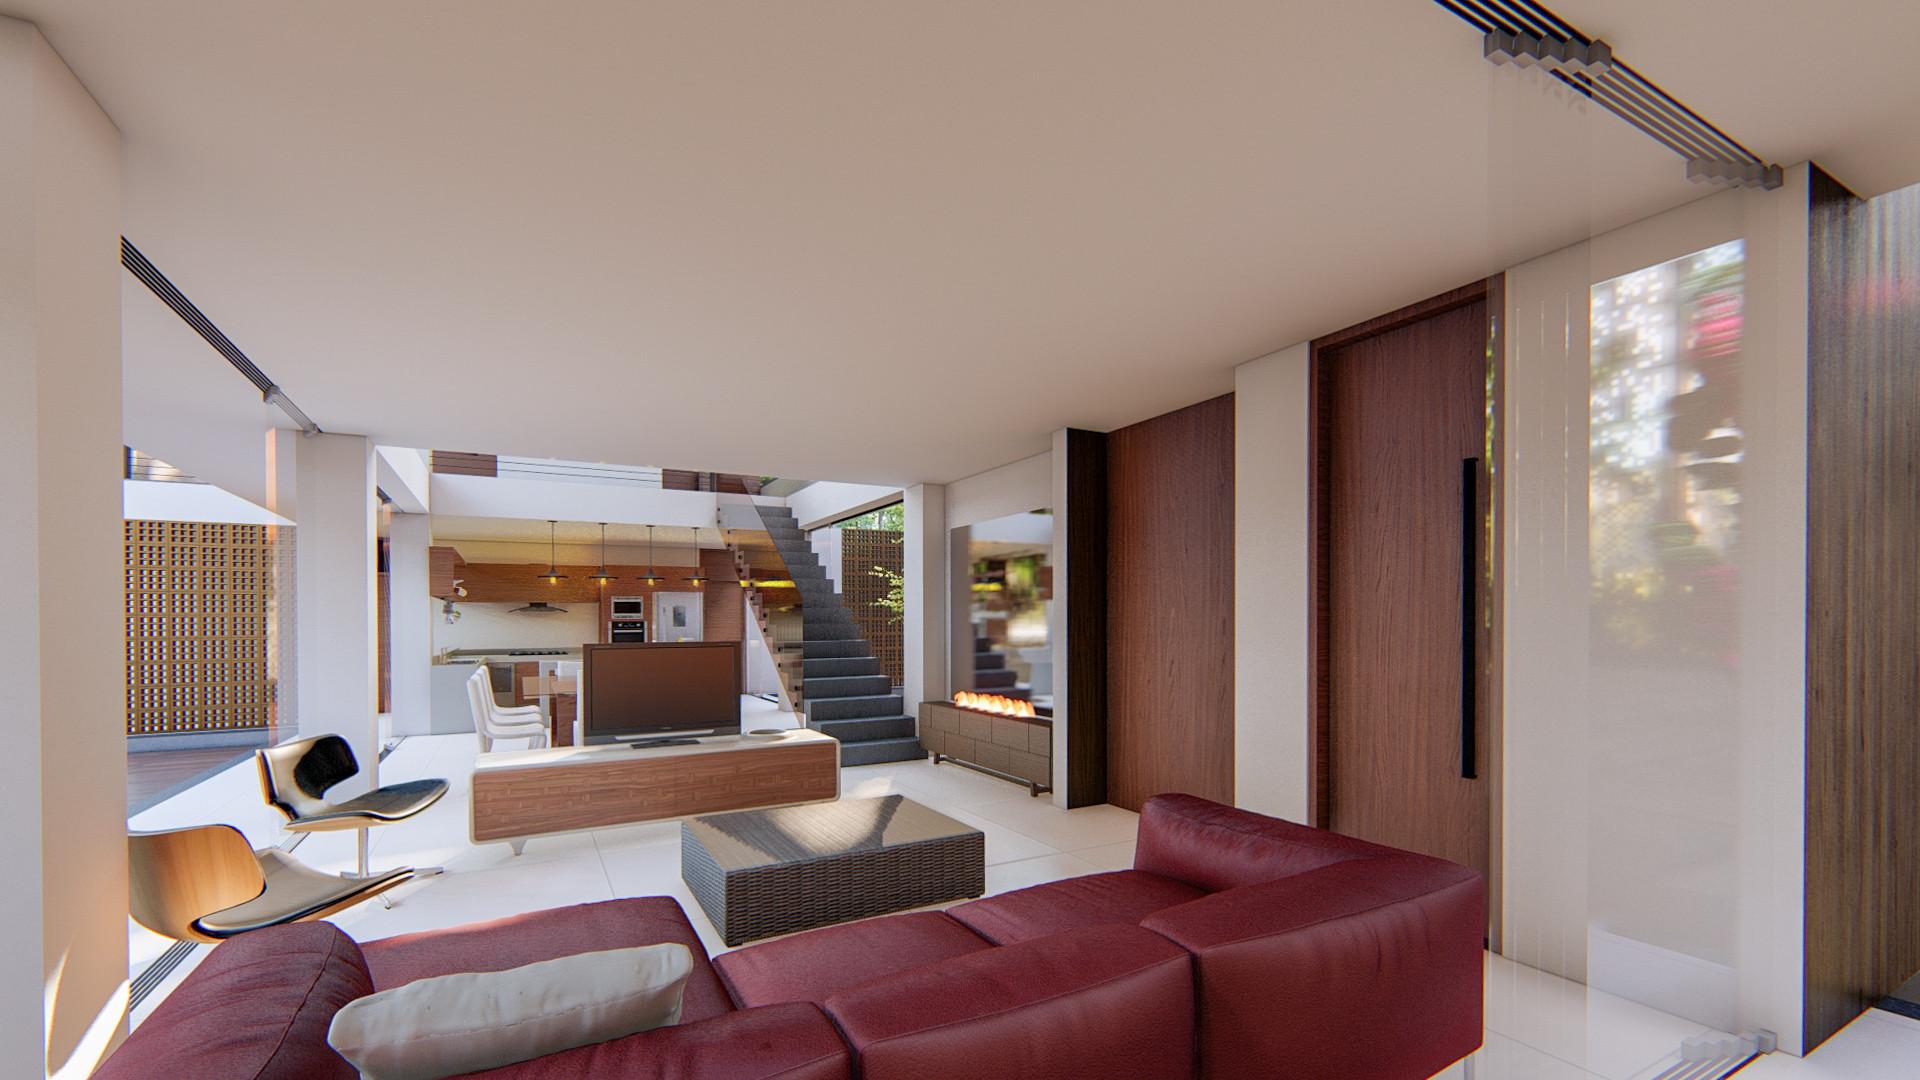 numen arquitetura - casa du charme (6).j